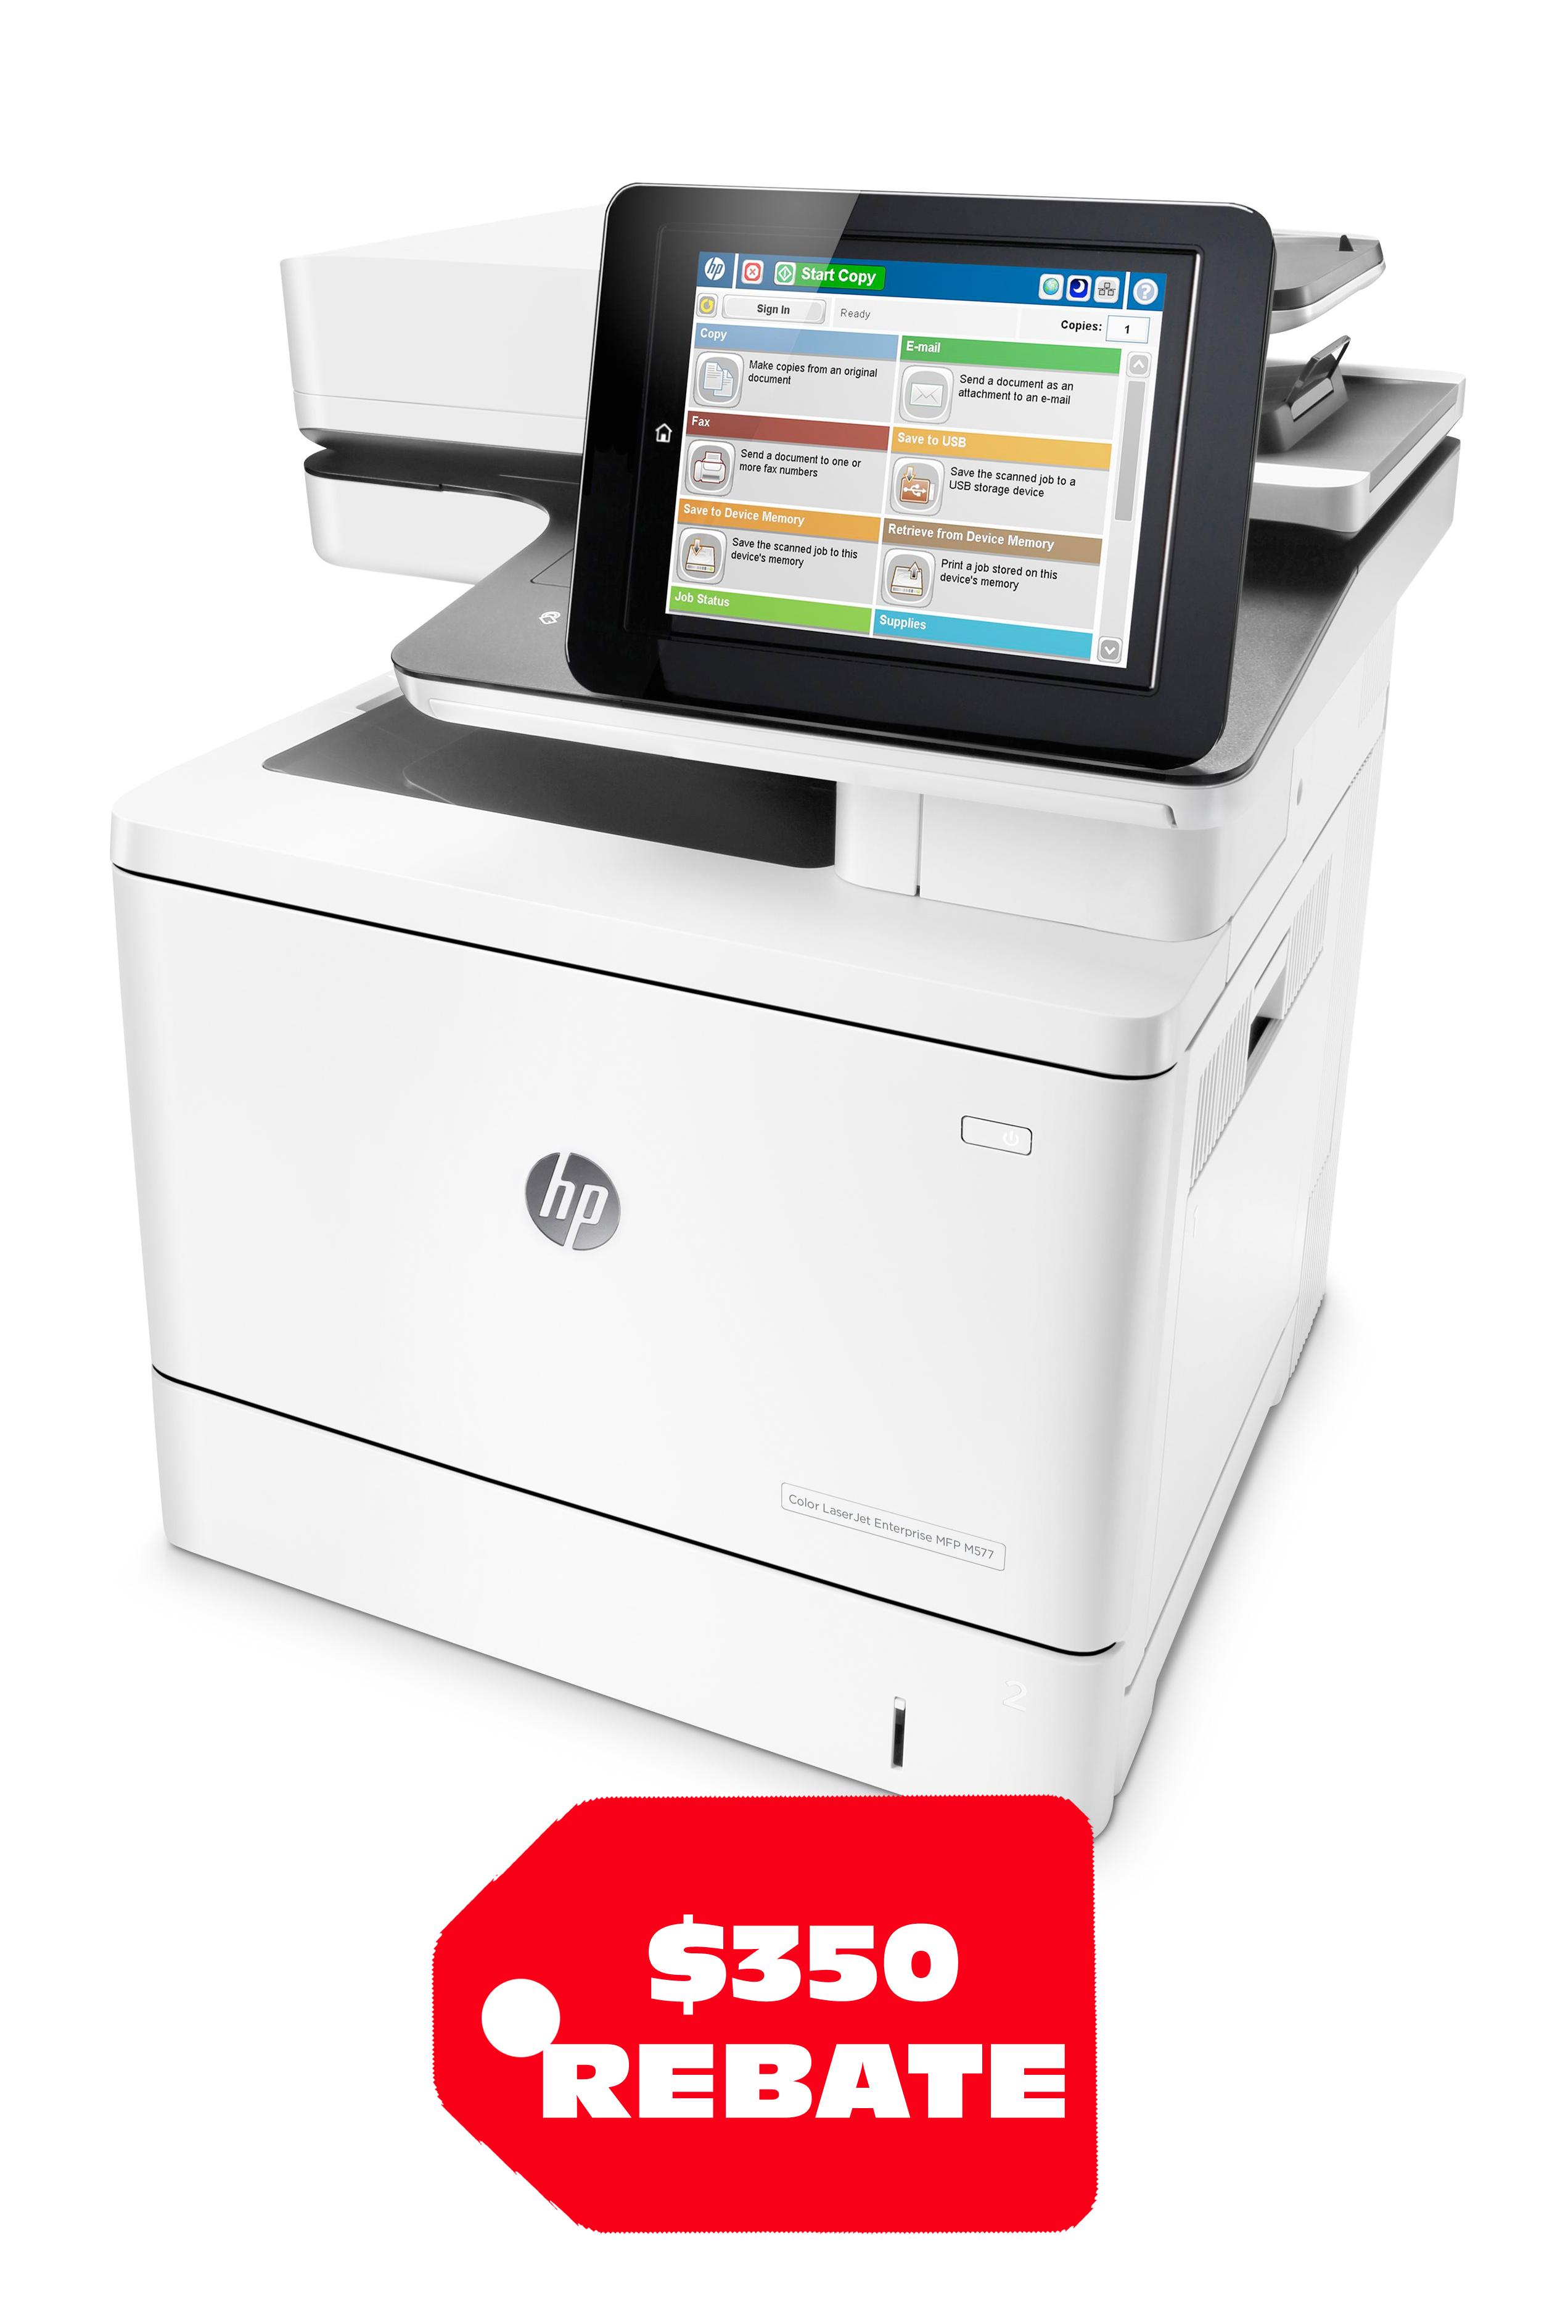 HP Color LaserJet Enterprise M577f 40ppm/ 40ppm Multifunction...